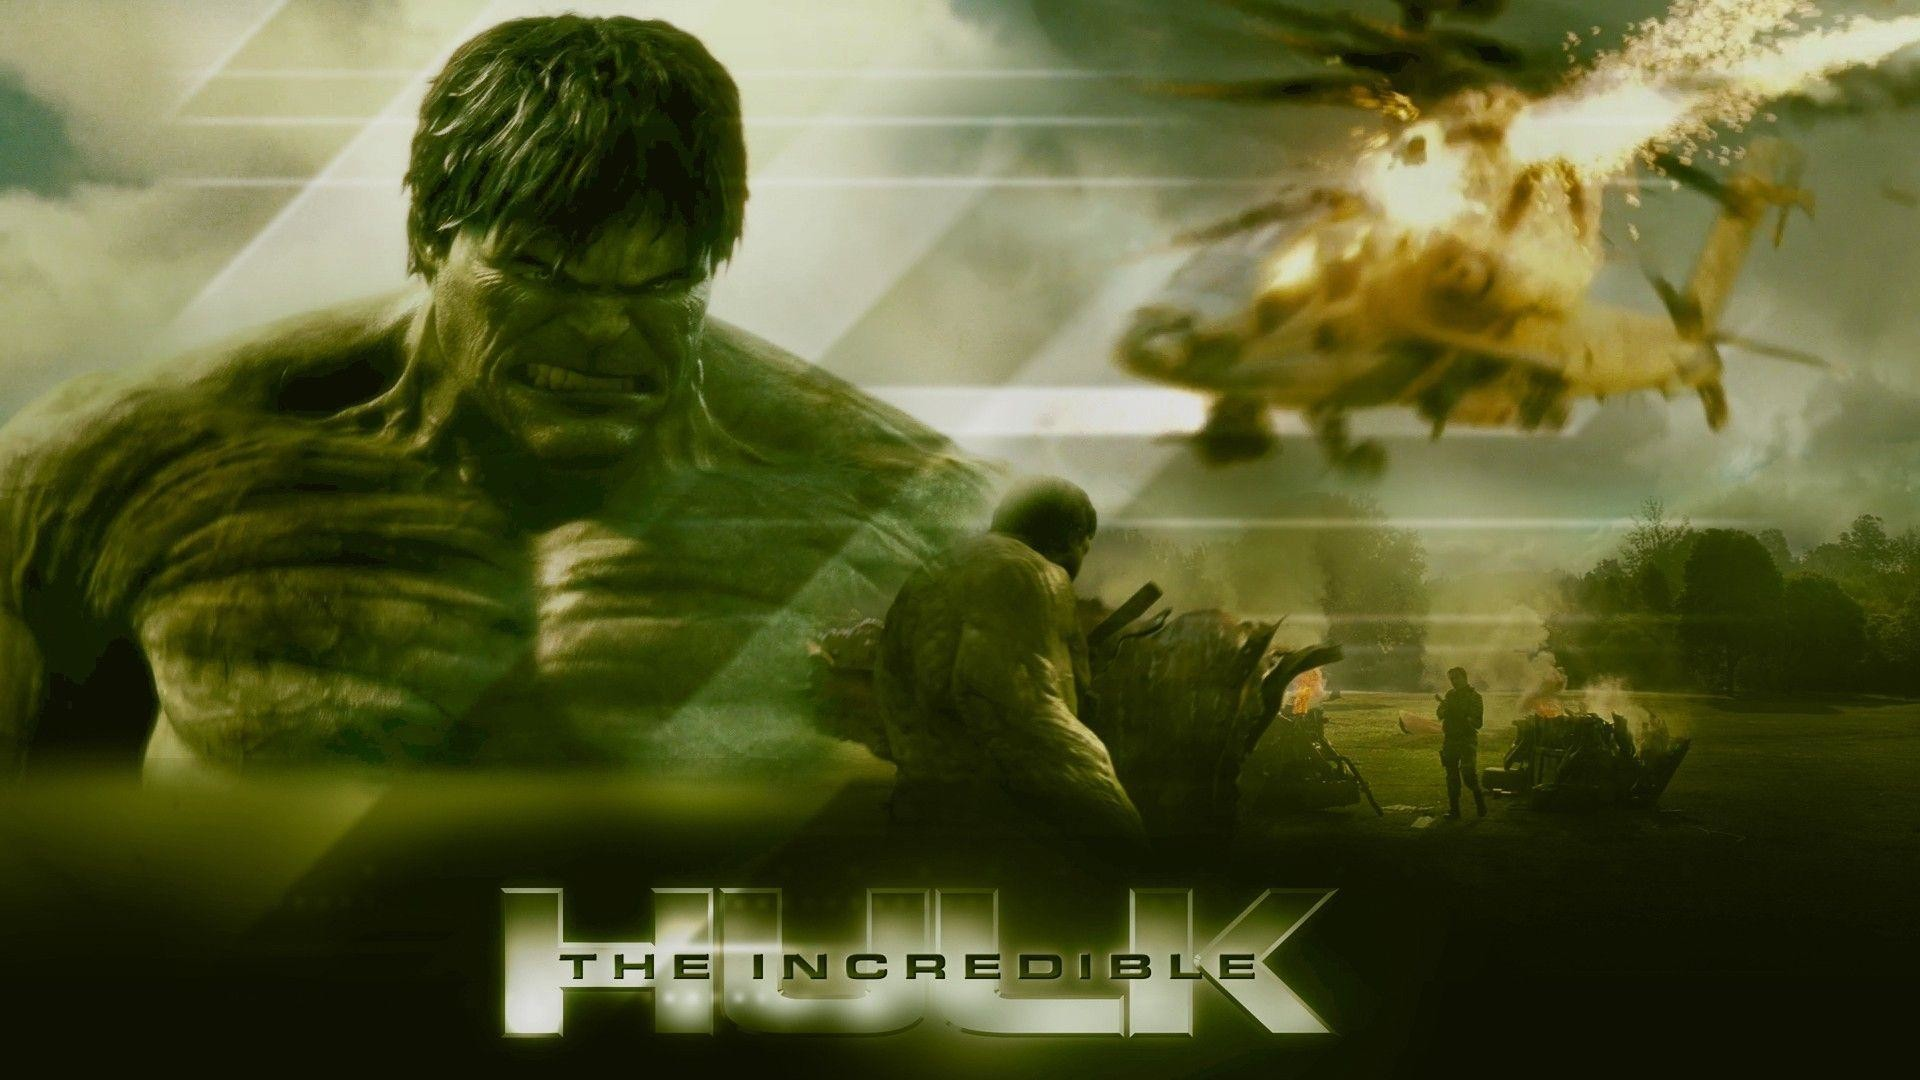 1920x1080 Hulk HD Wallpapers 1080p